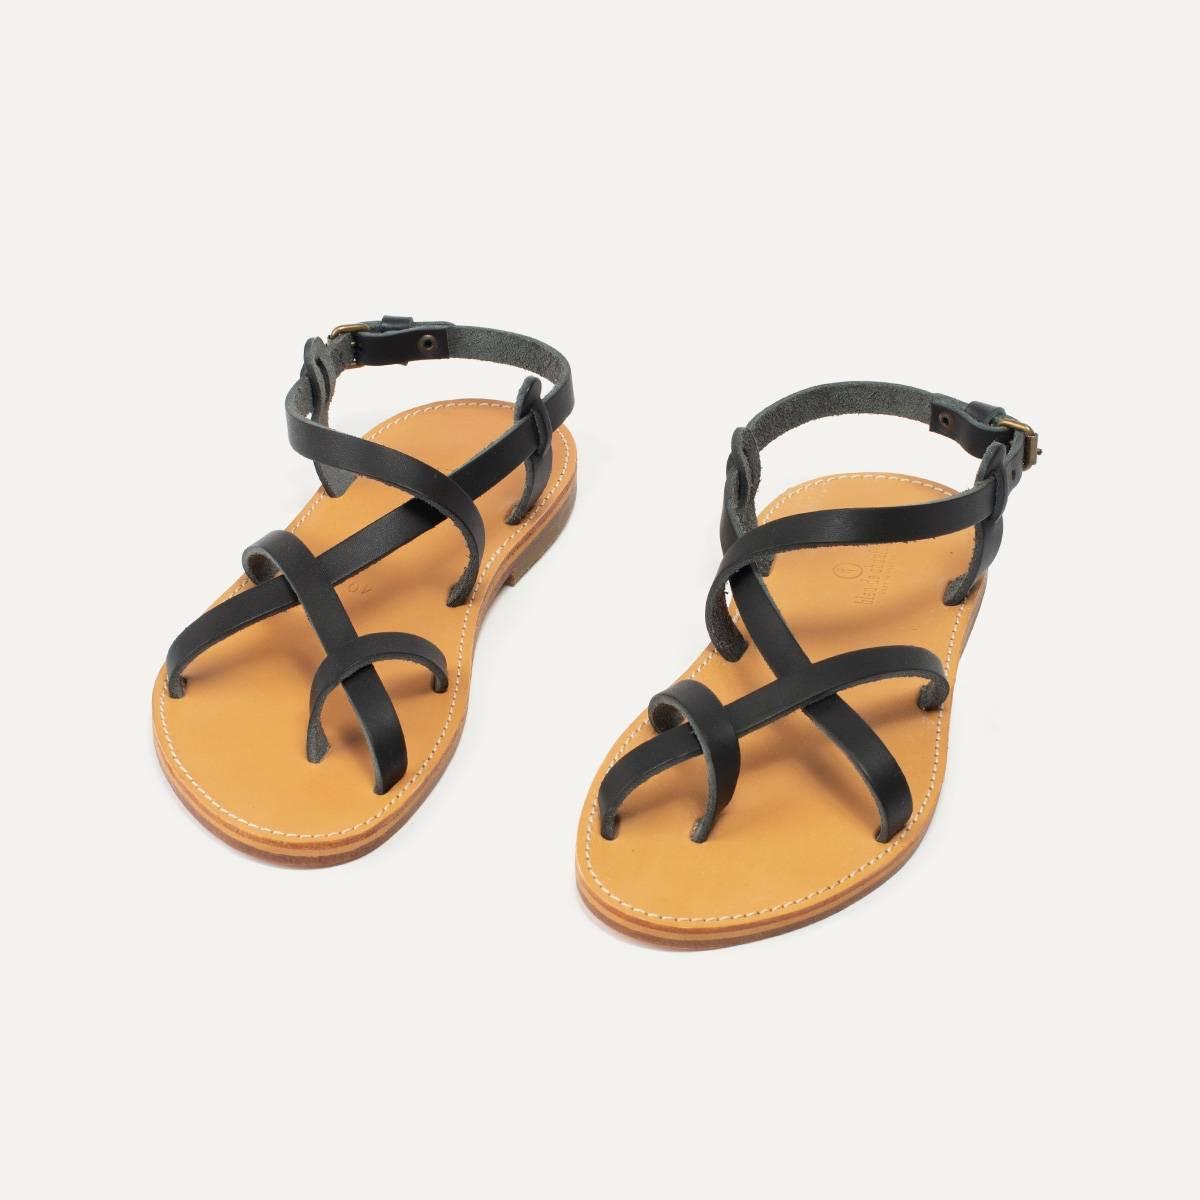 Nara leather sandals - Black (image n°5)